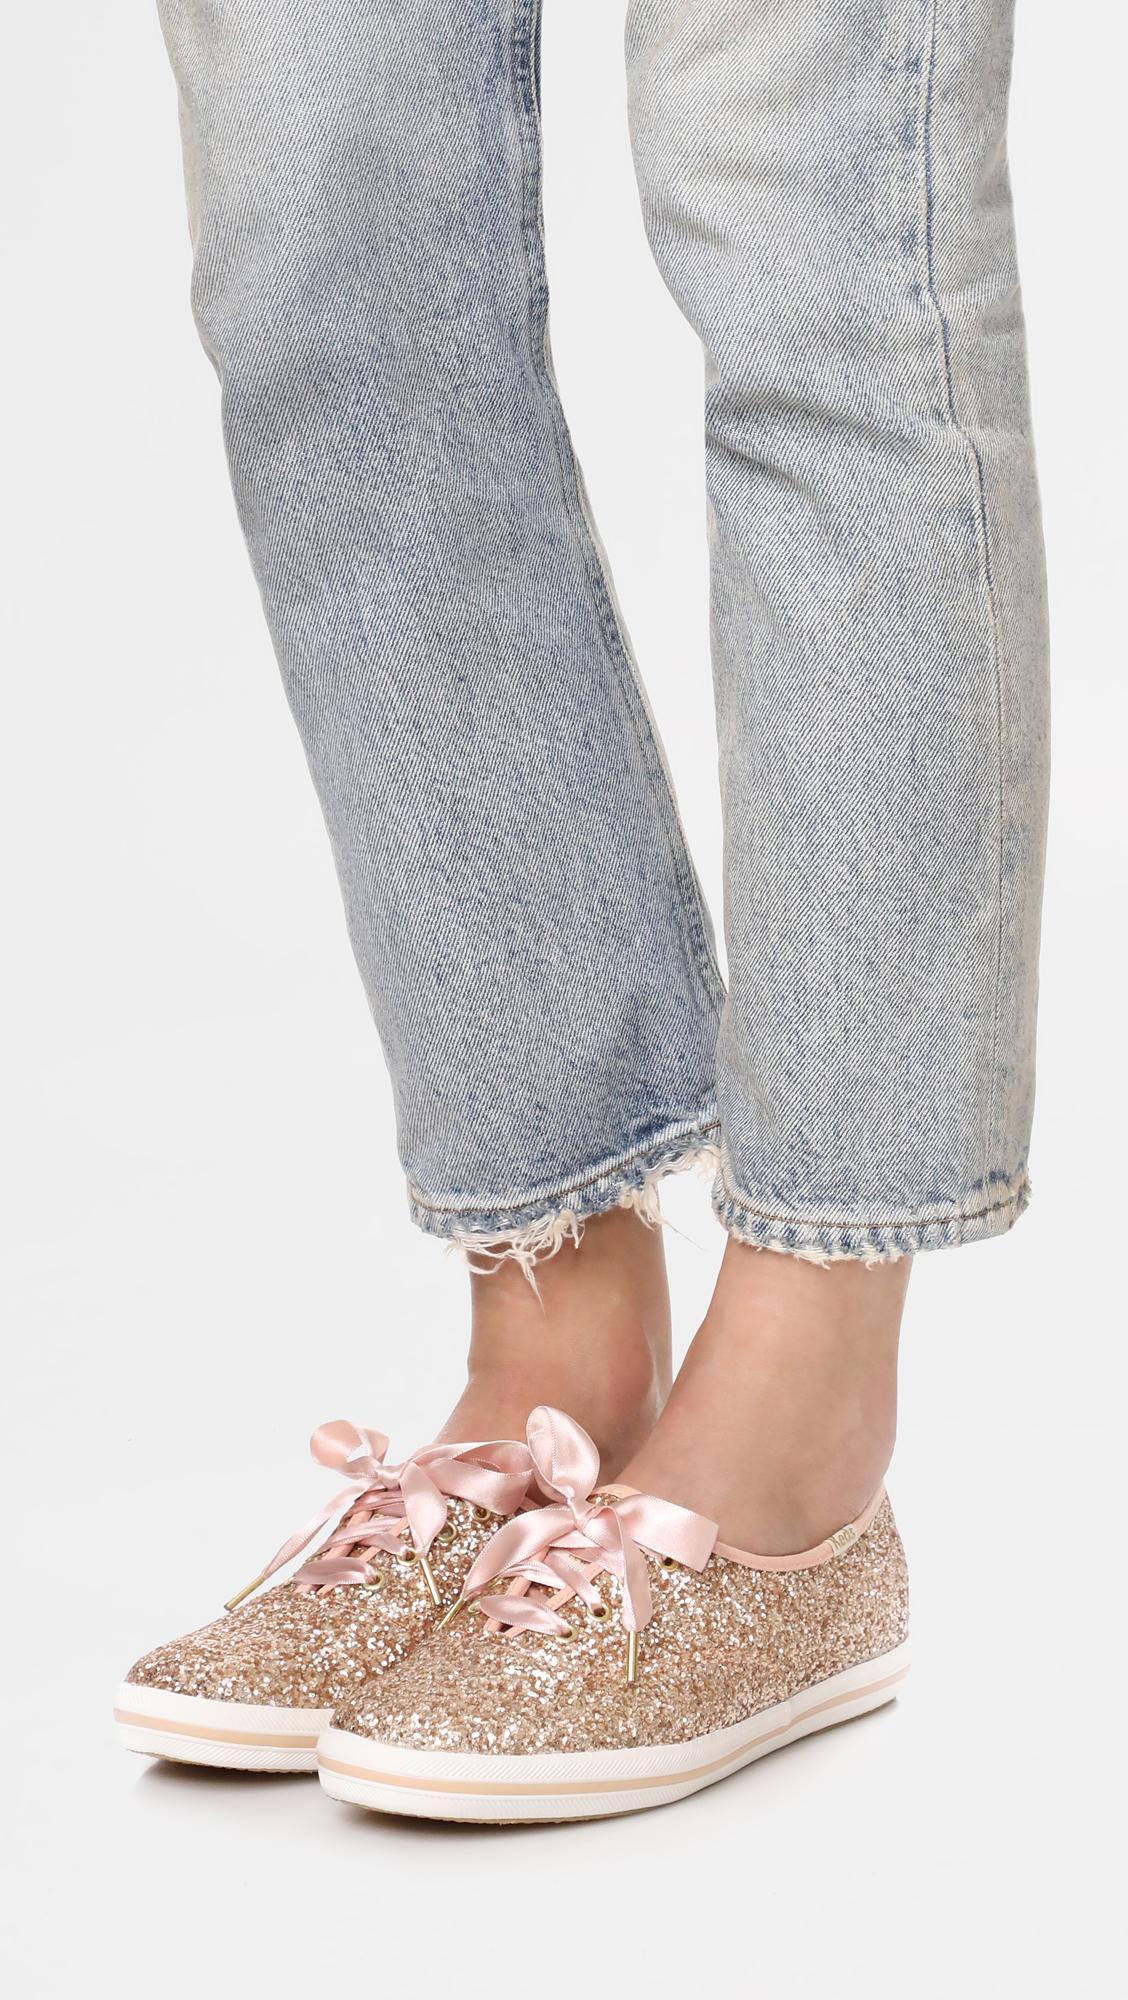 720ec30157458 Keds - Pink X Kate Spade New York Glitter Sneakers - Lyst. View fullscreen